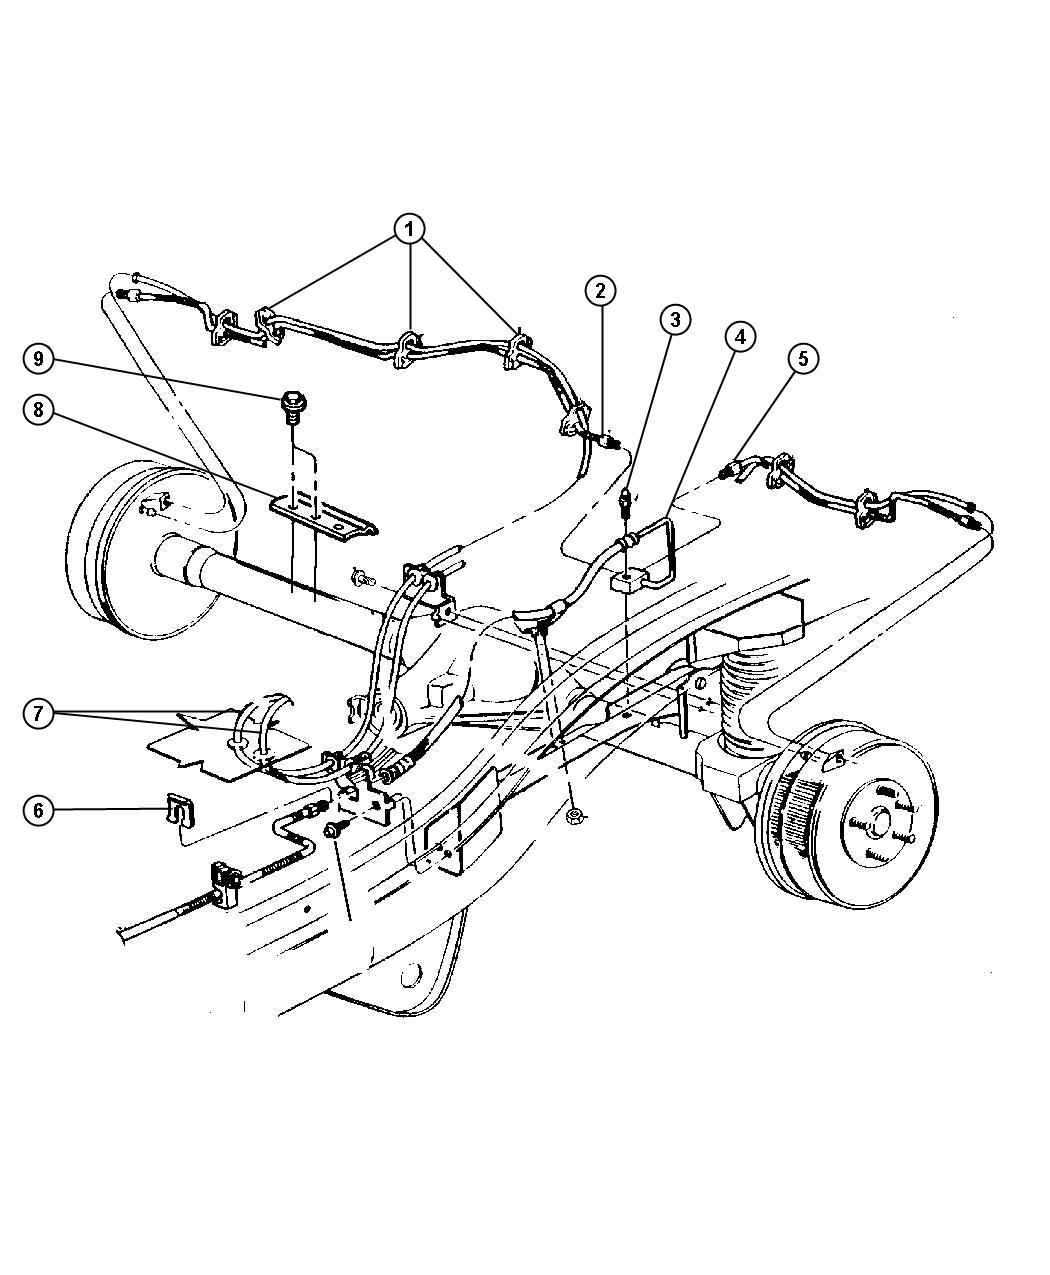 2009 jeep patriot clip tube to speed sensor mounting 2009 jeep patriot parts diagram 2009 jeep patriot parts diagram 2009 jeep patriot parts diagram 2009 jeep patriot parts diagram